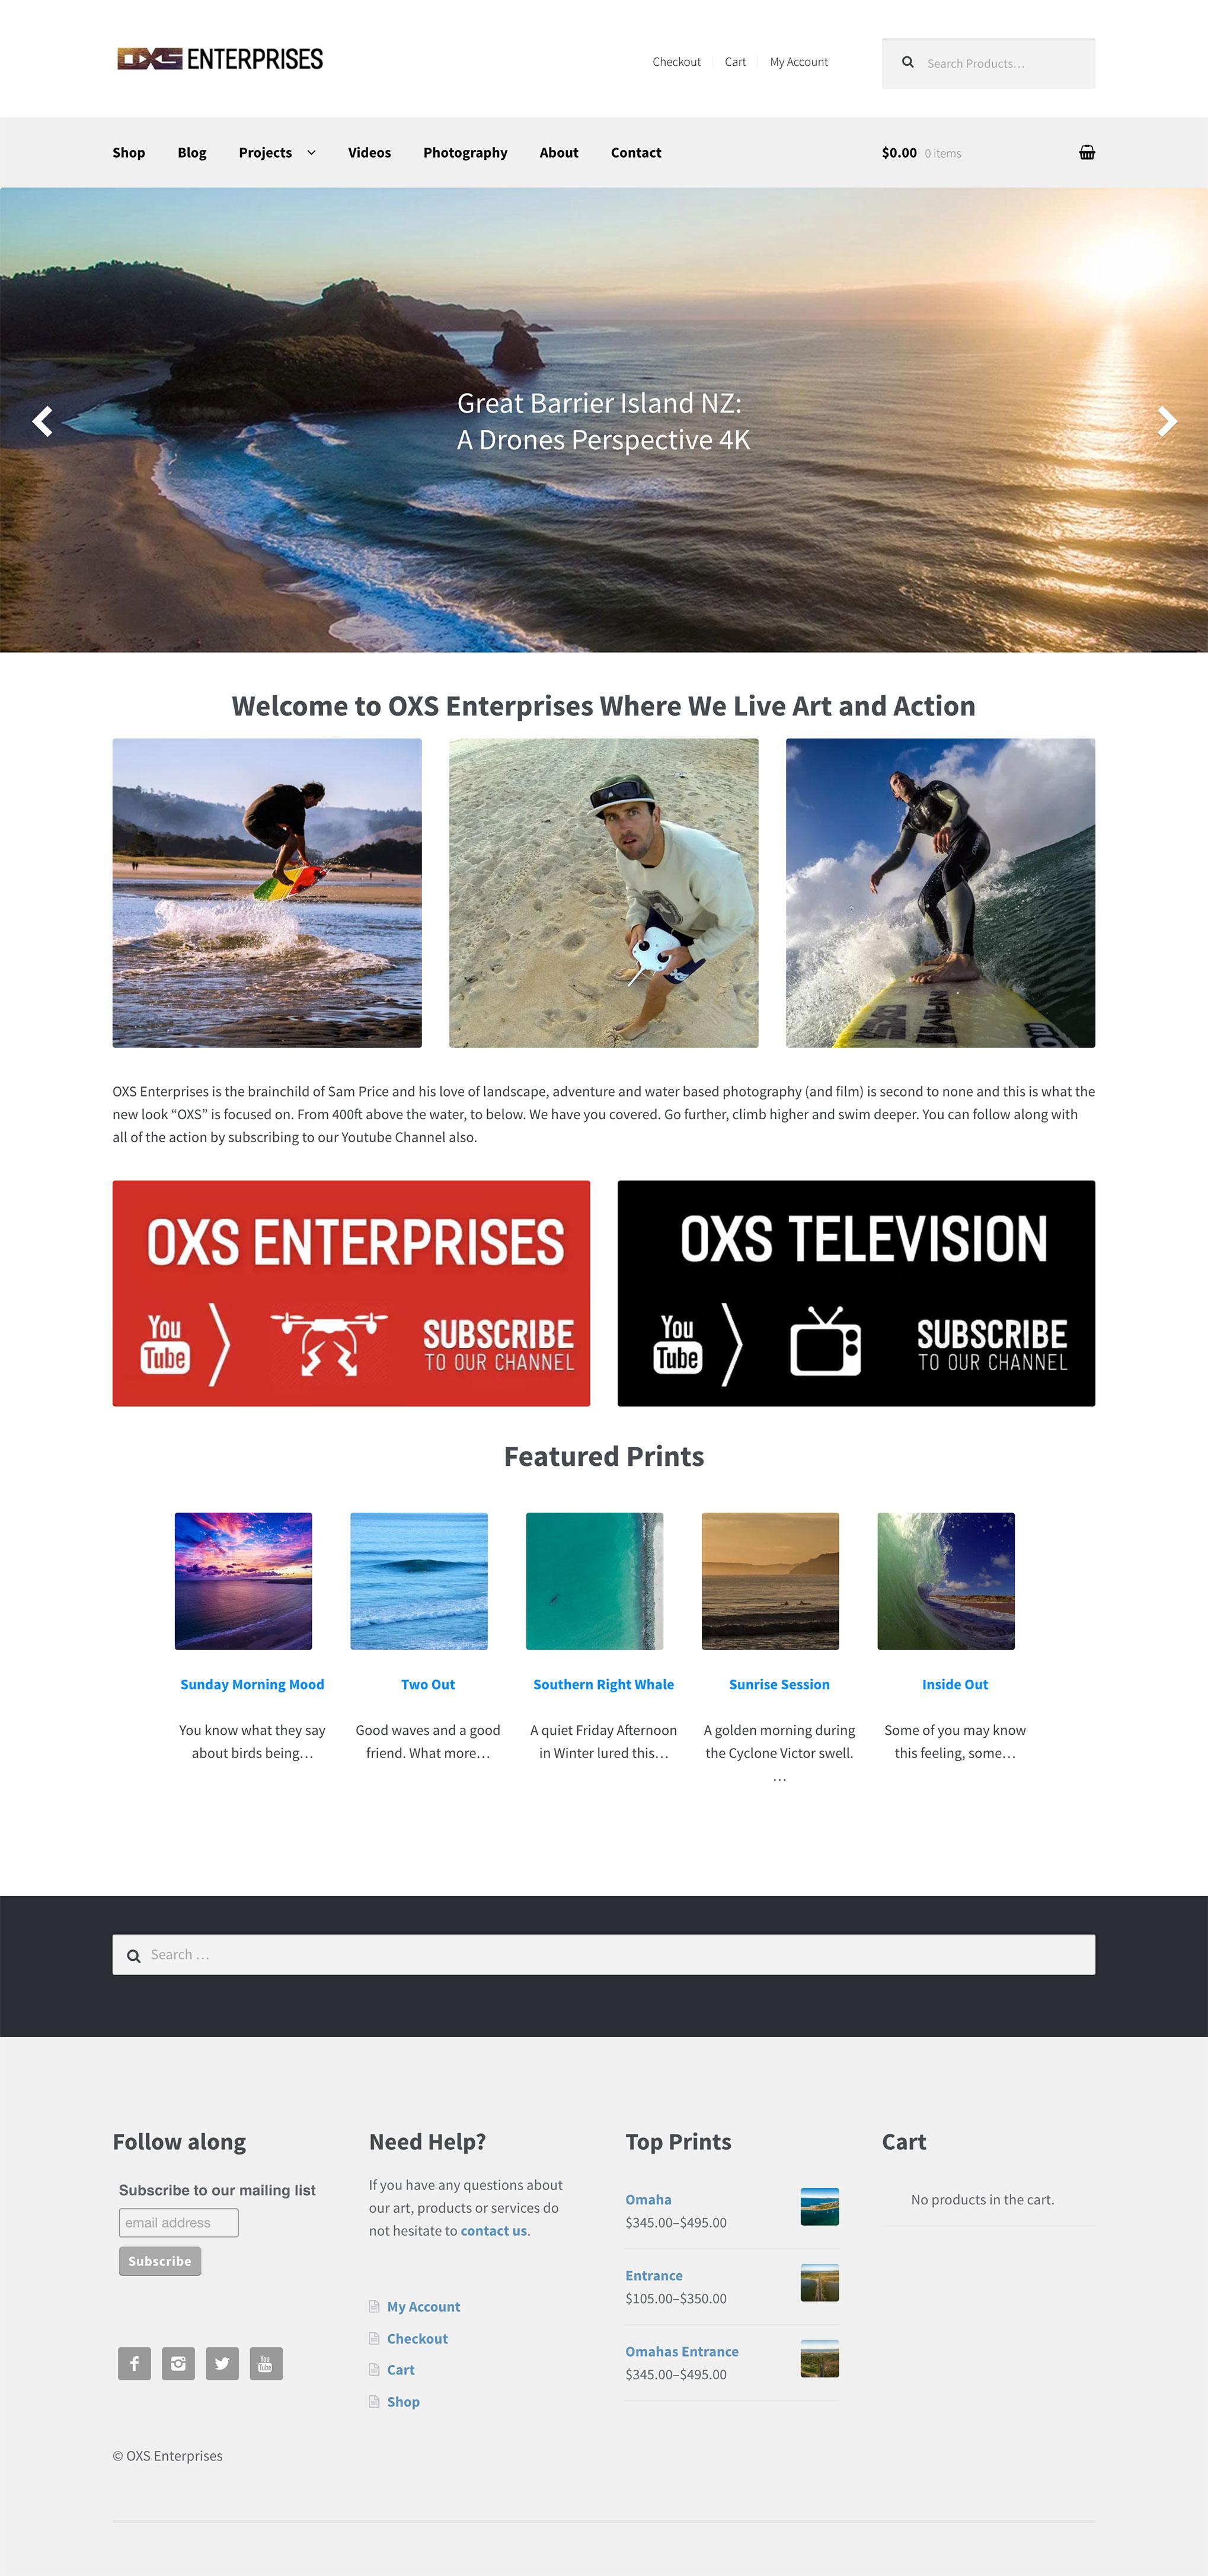 oxs-enterprises-home-page